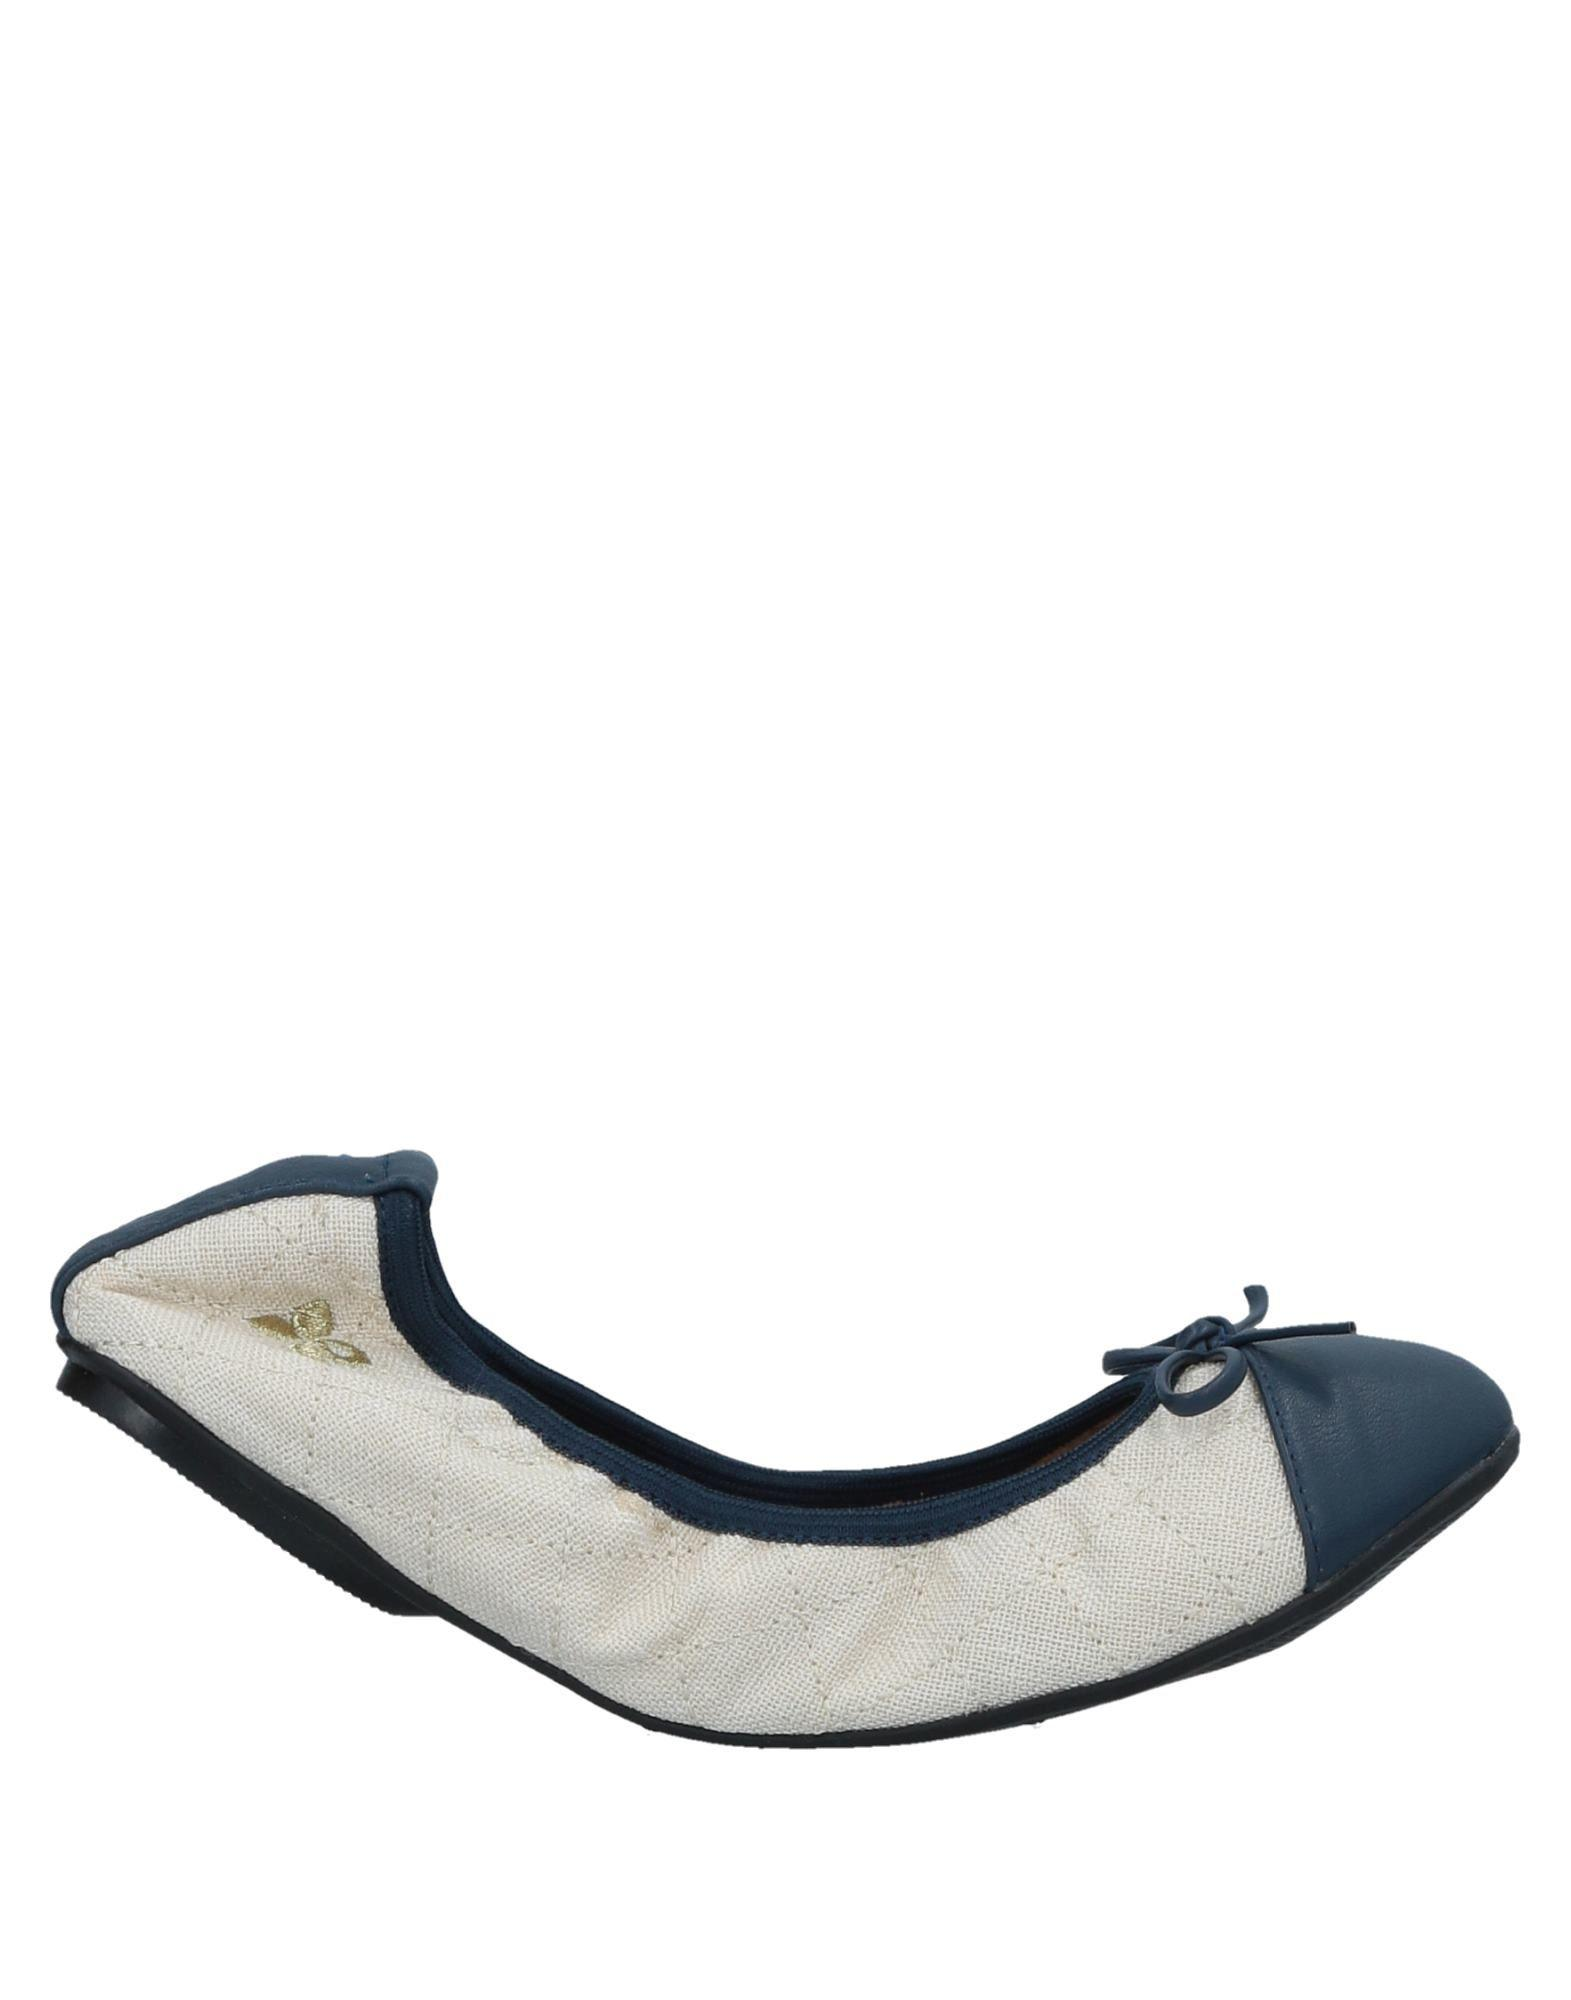 33cd1762e012 Butterfly Twist Ballet Shoes - Best Image Of Butterfly Imagevet.Co